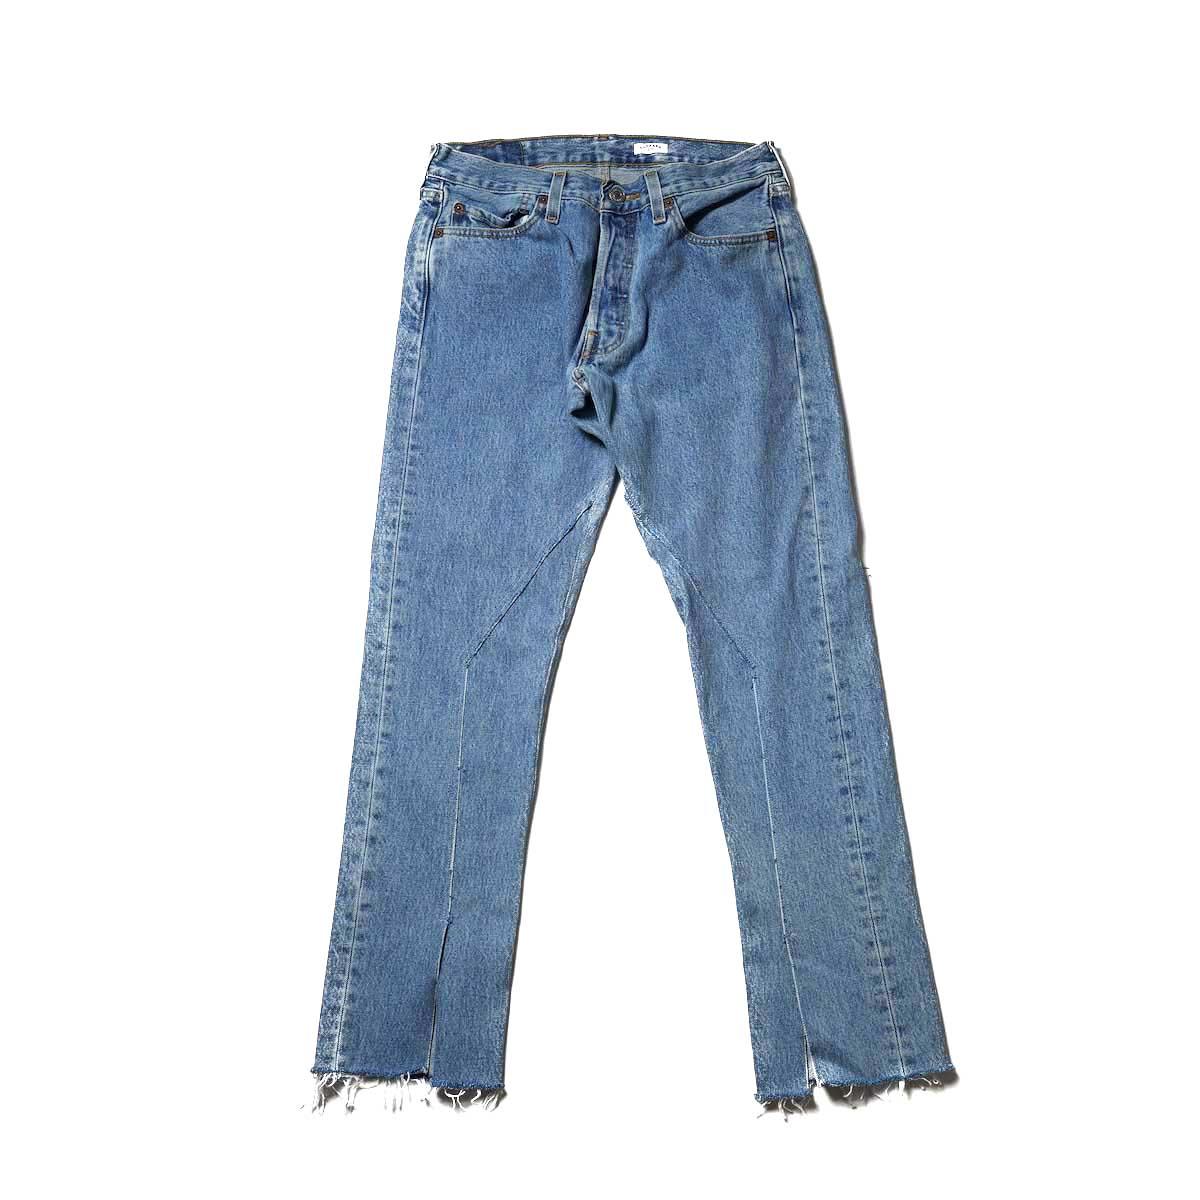 OLD PARK / Slit Jeans (Blue) Ssize-B